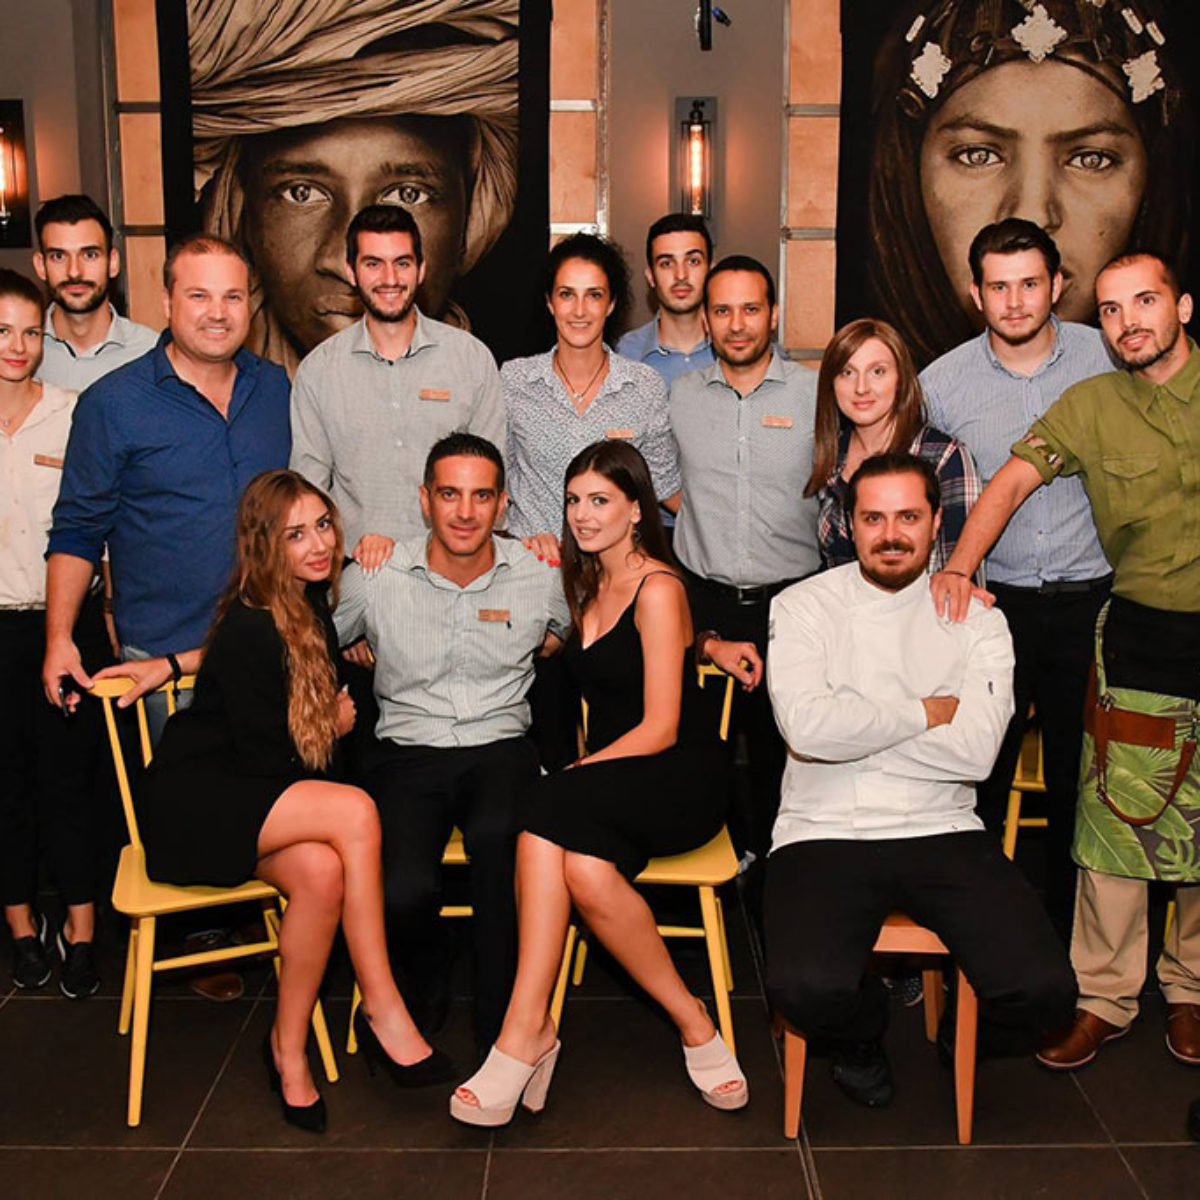 Yiamas Gastro Bar - Καλαμάτα - Μοντέρνα Ευρωπαϊκή Κουζίνα - Team 7